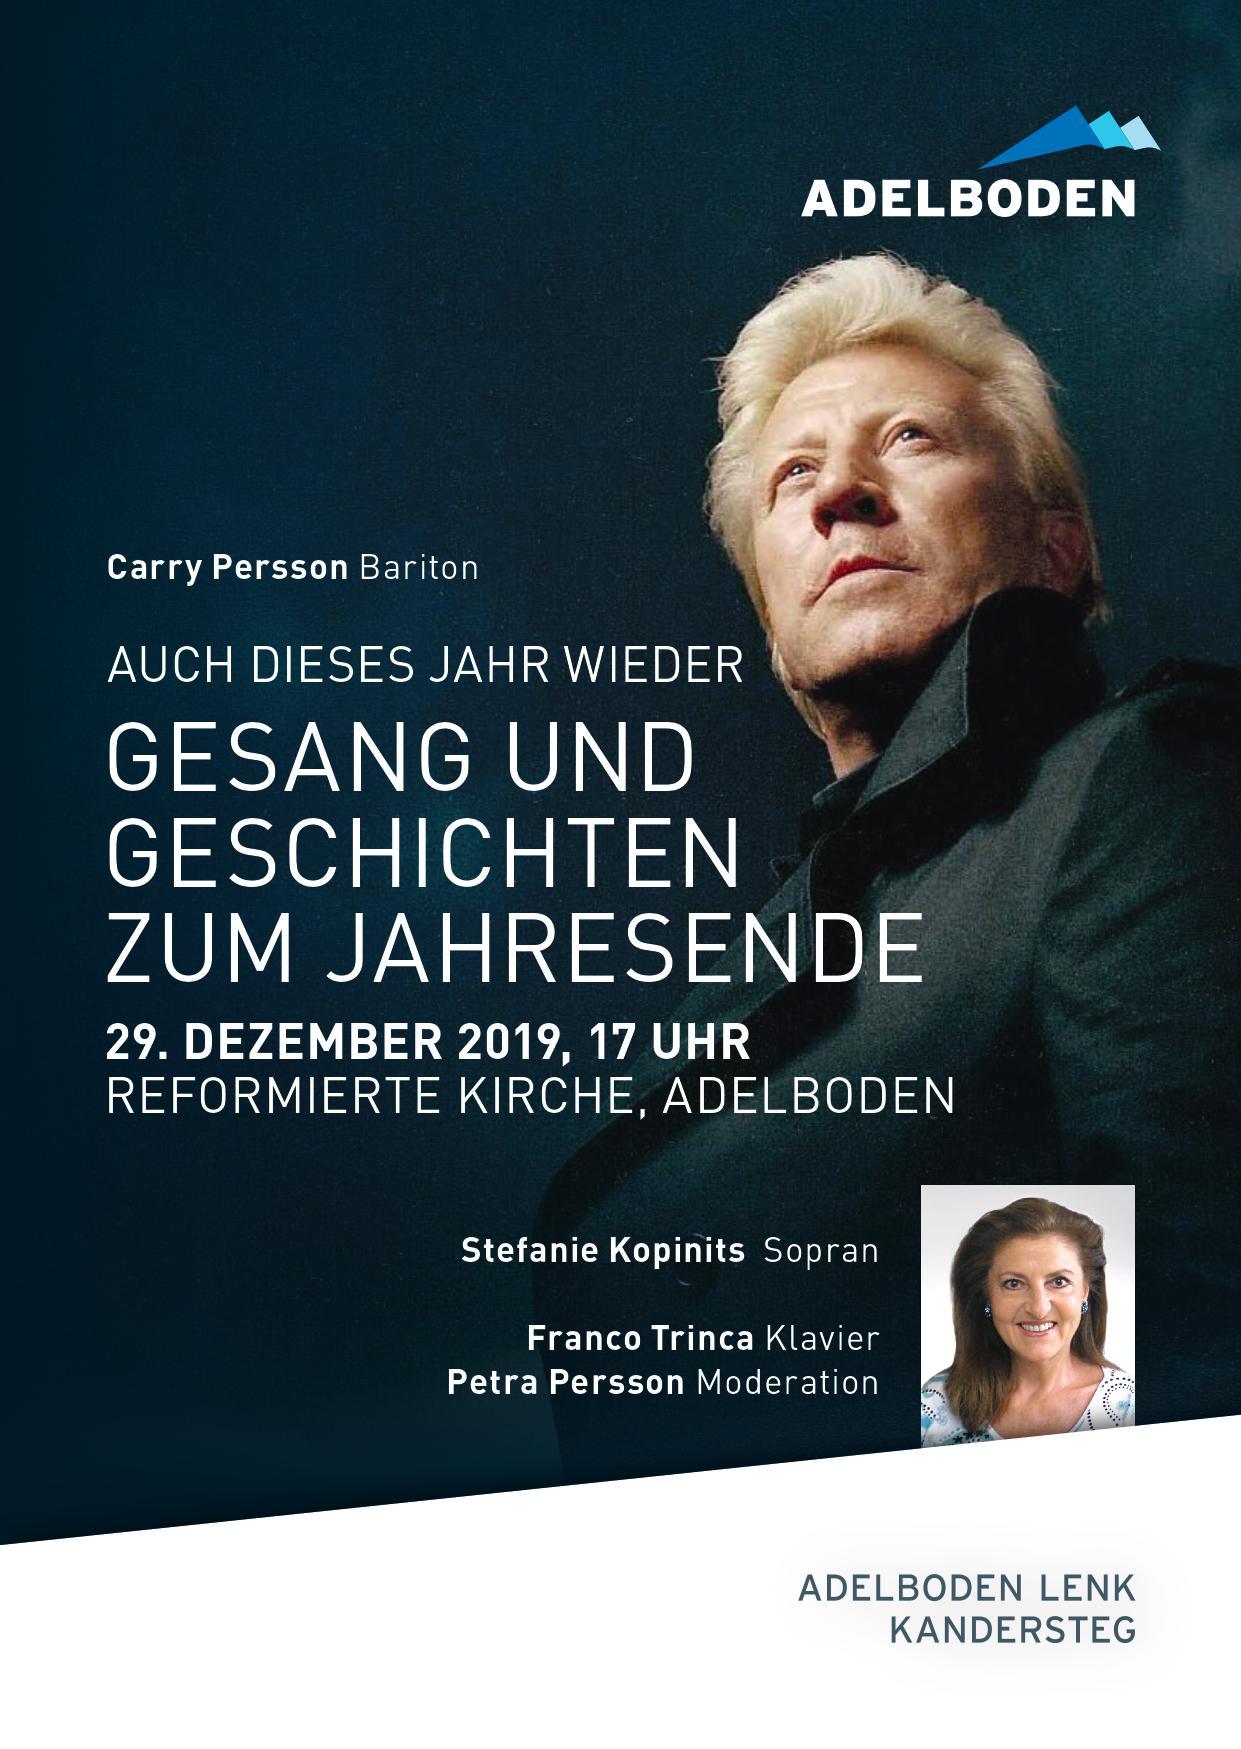 Carry Persson - Bariton - Reformierte Kirche Adelboden